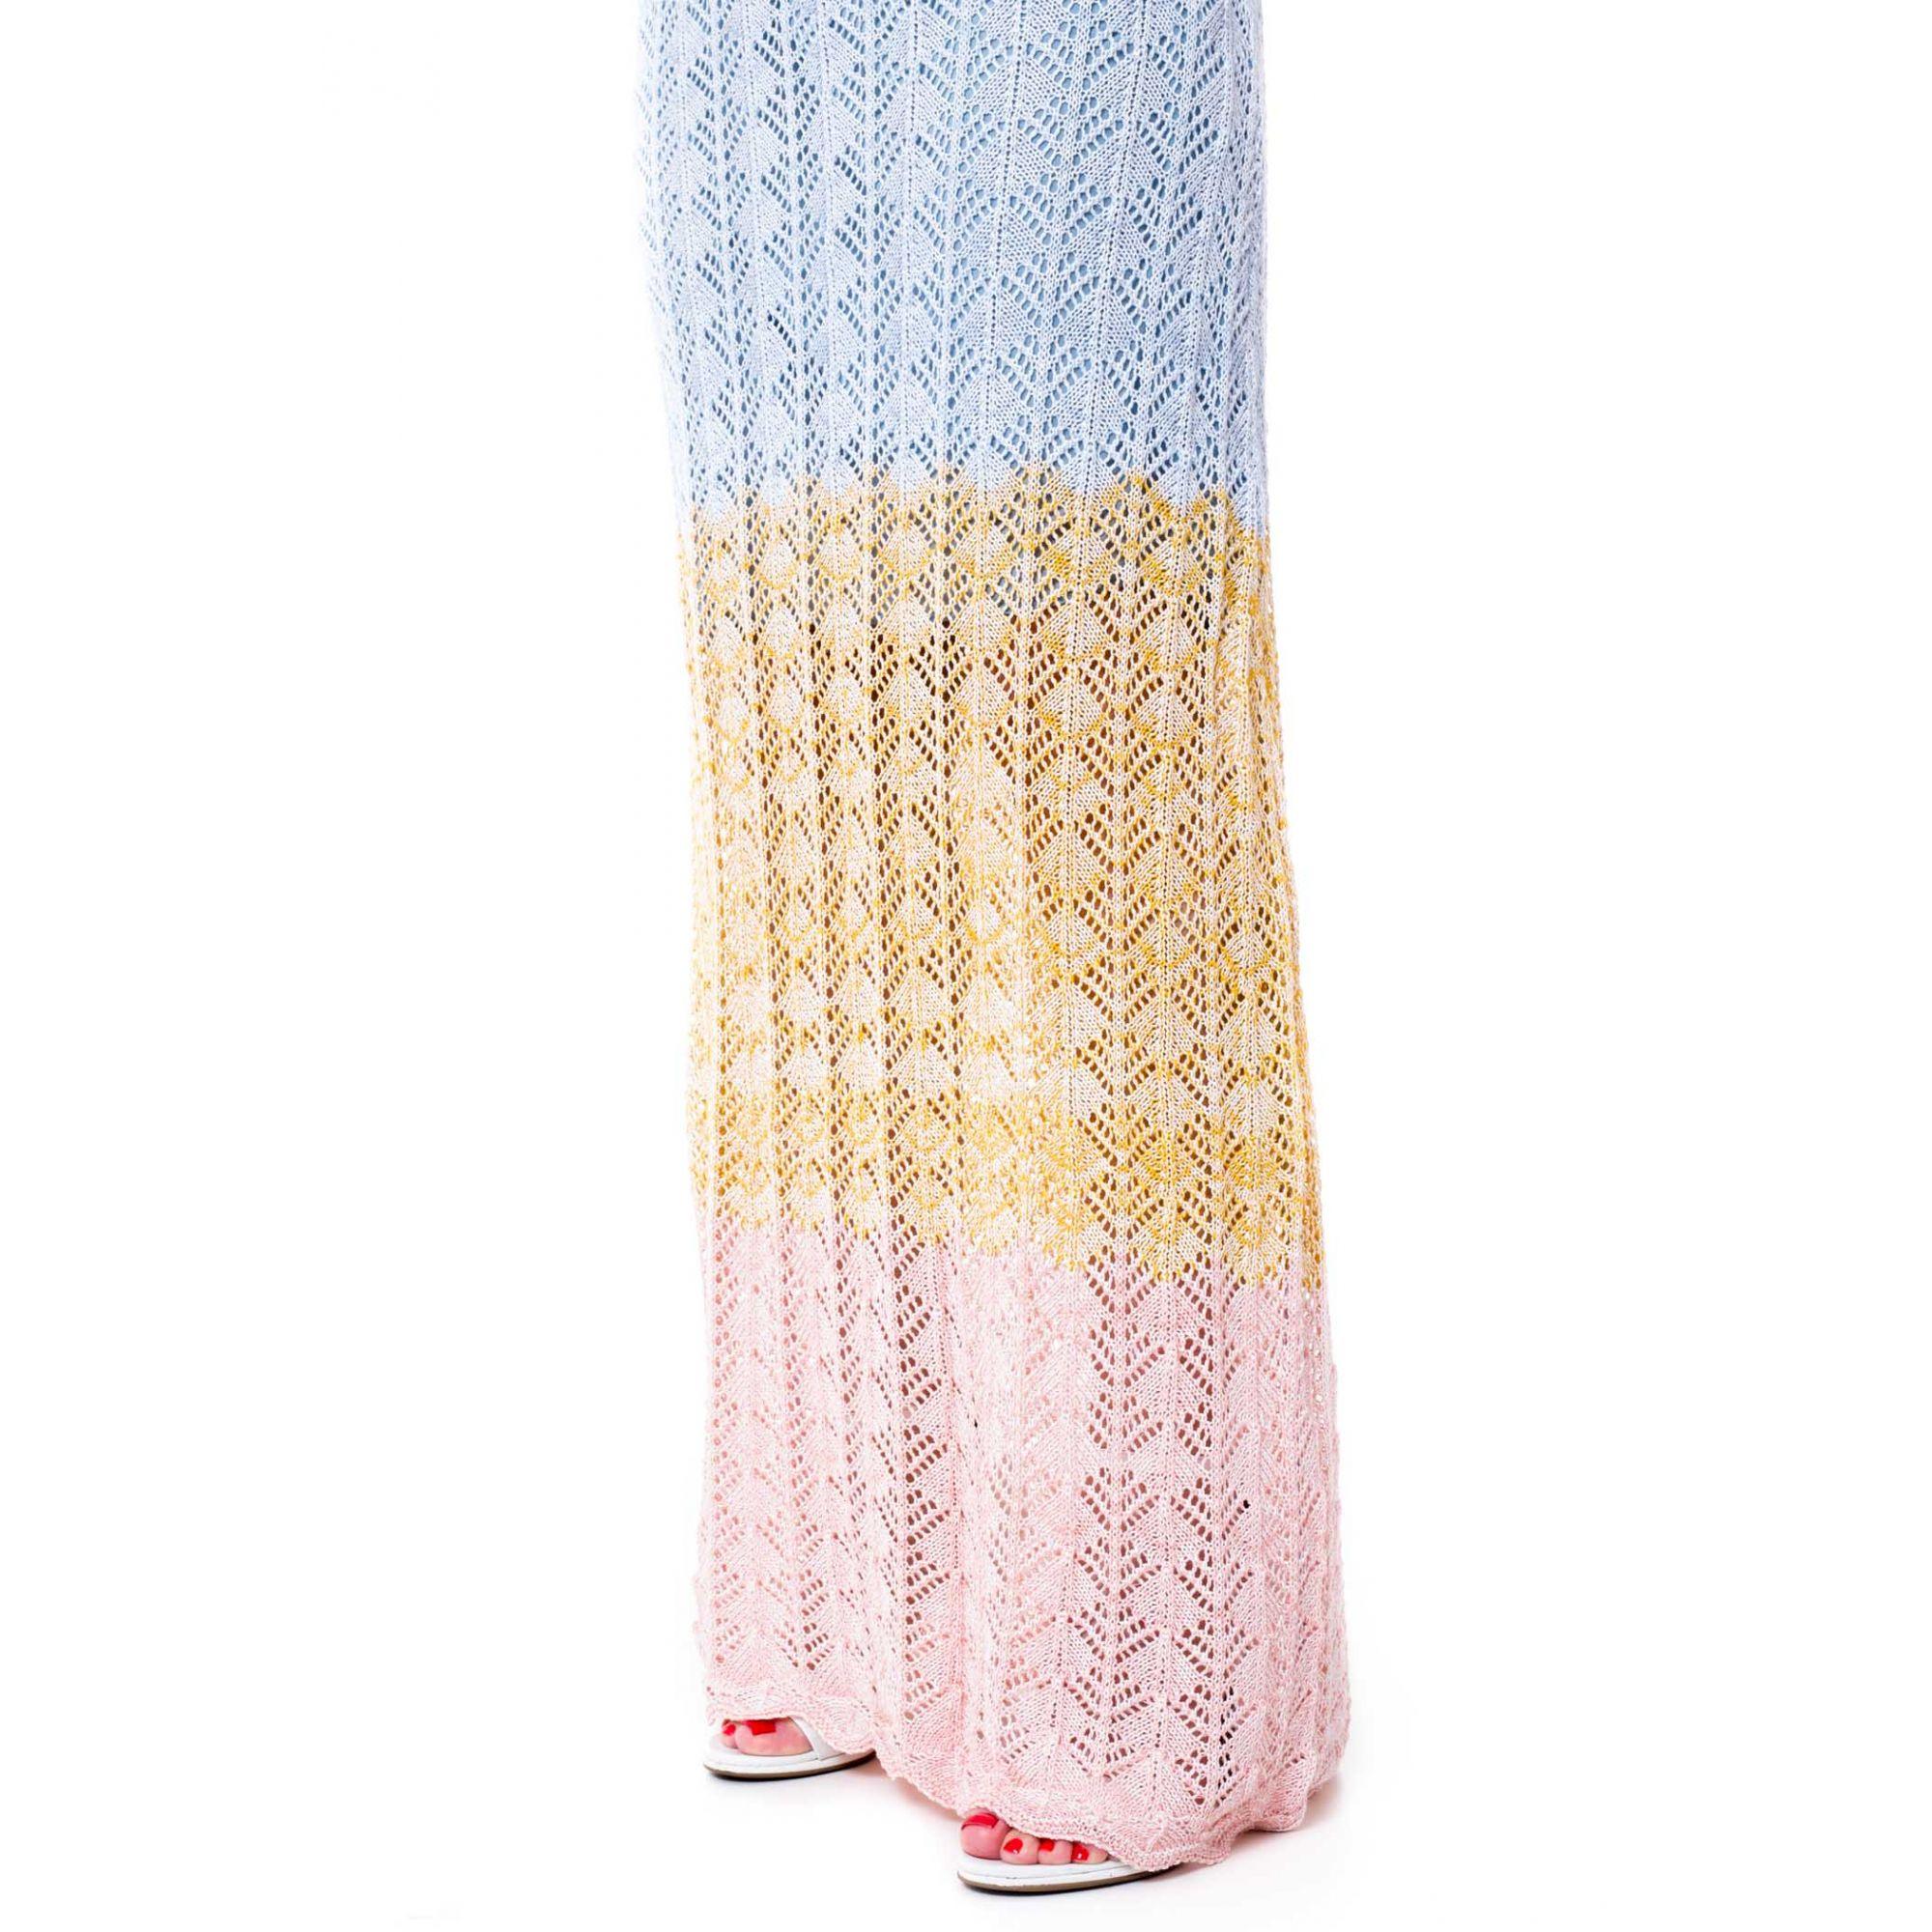 Vestido Longo Vera Tricot Ombro a Ombro Tie Dye Feminino Rosa / Amarelo / Azul